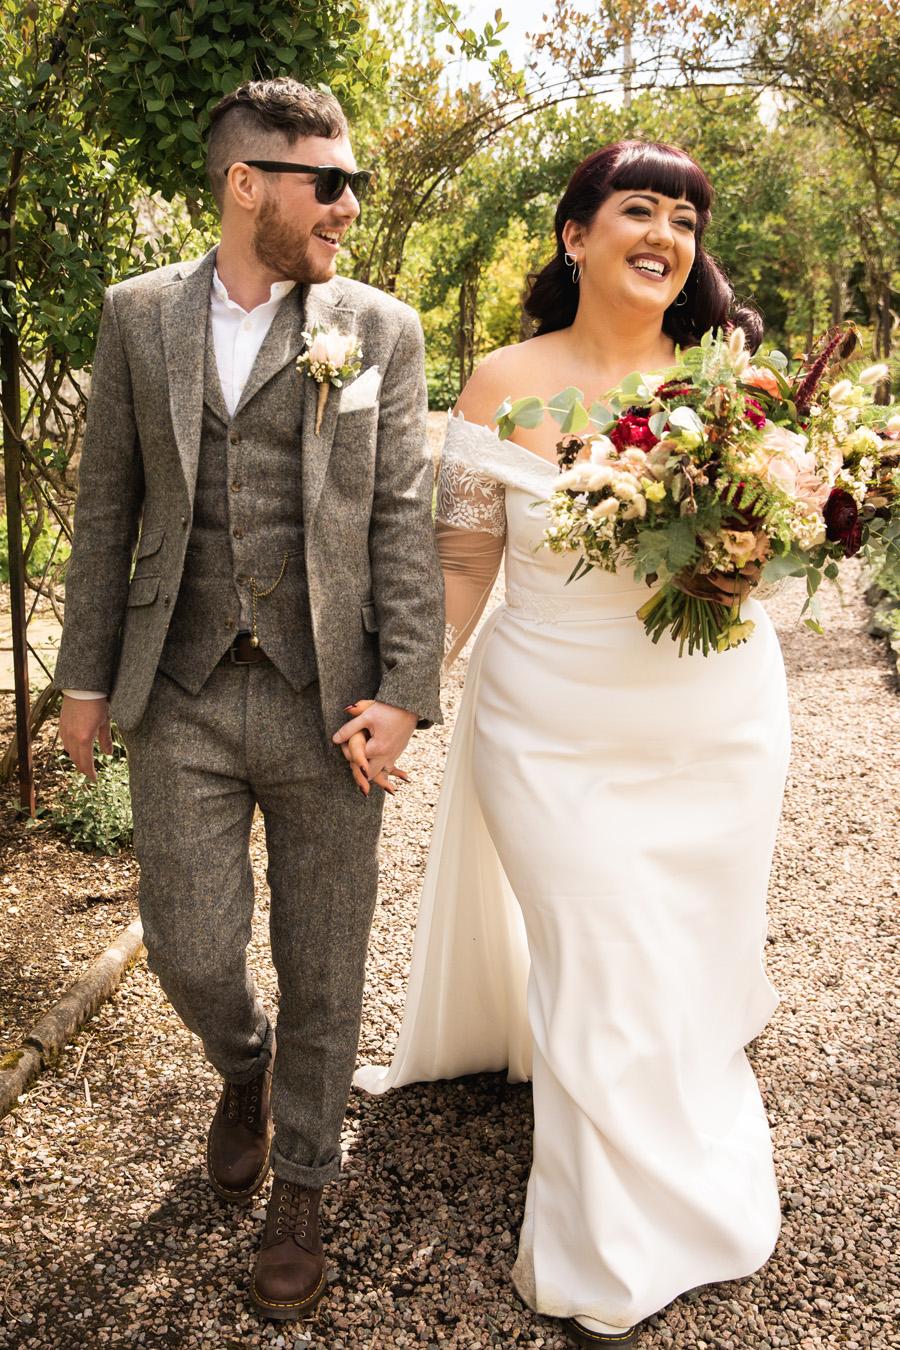 MeghannStephen_Wedding_Photo_Story_2019-115.jpg